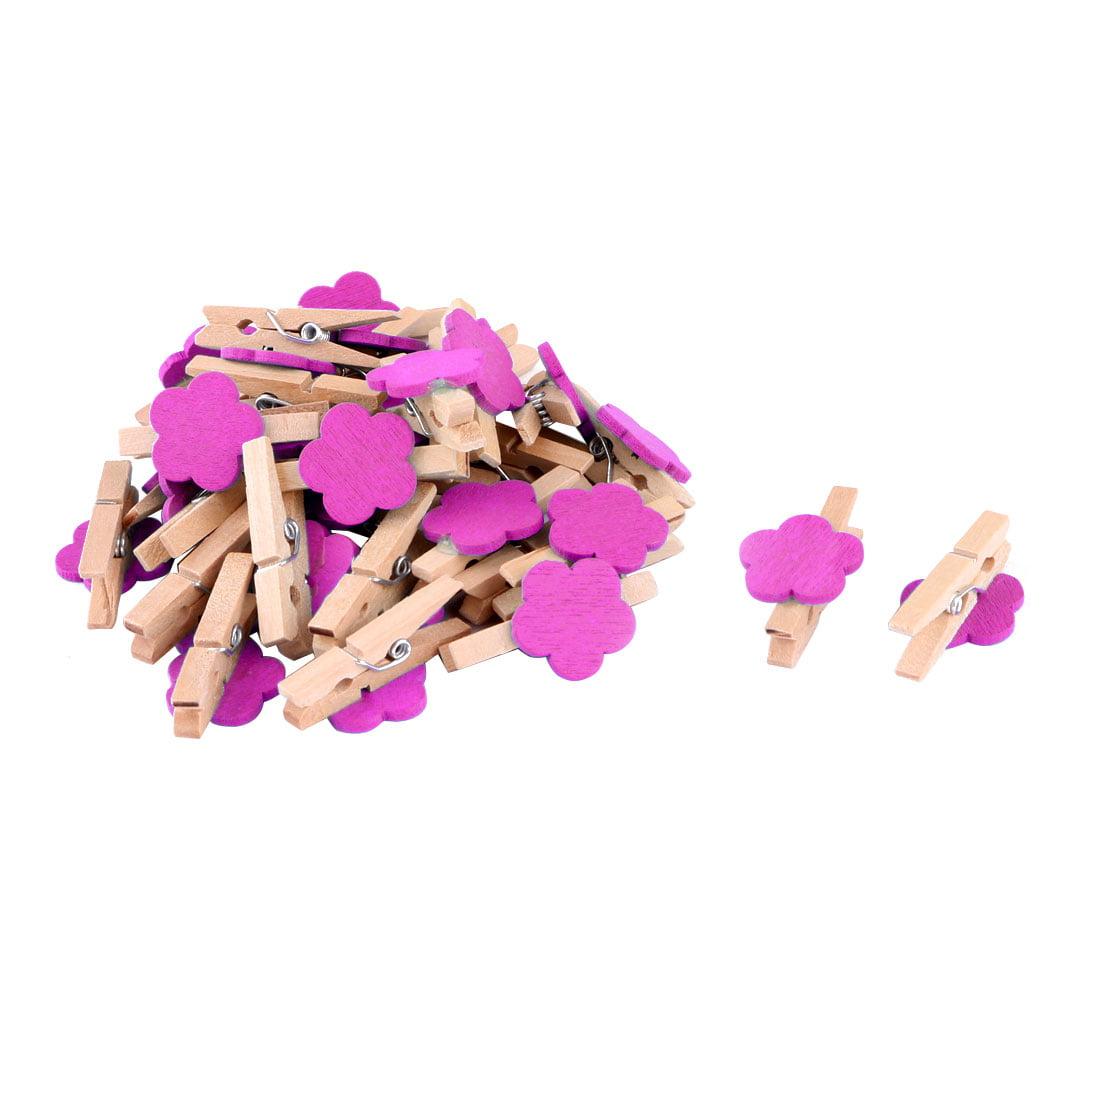 Household Wooden Flower Shape DIY Crafts Card Photo Decor Peg Clip Fuchsia 30pcs